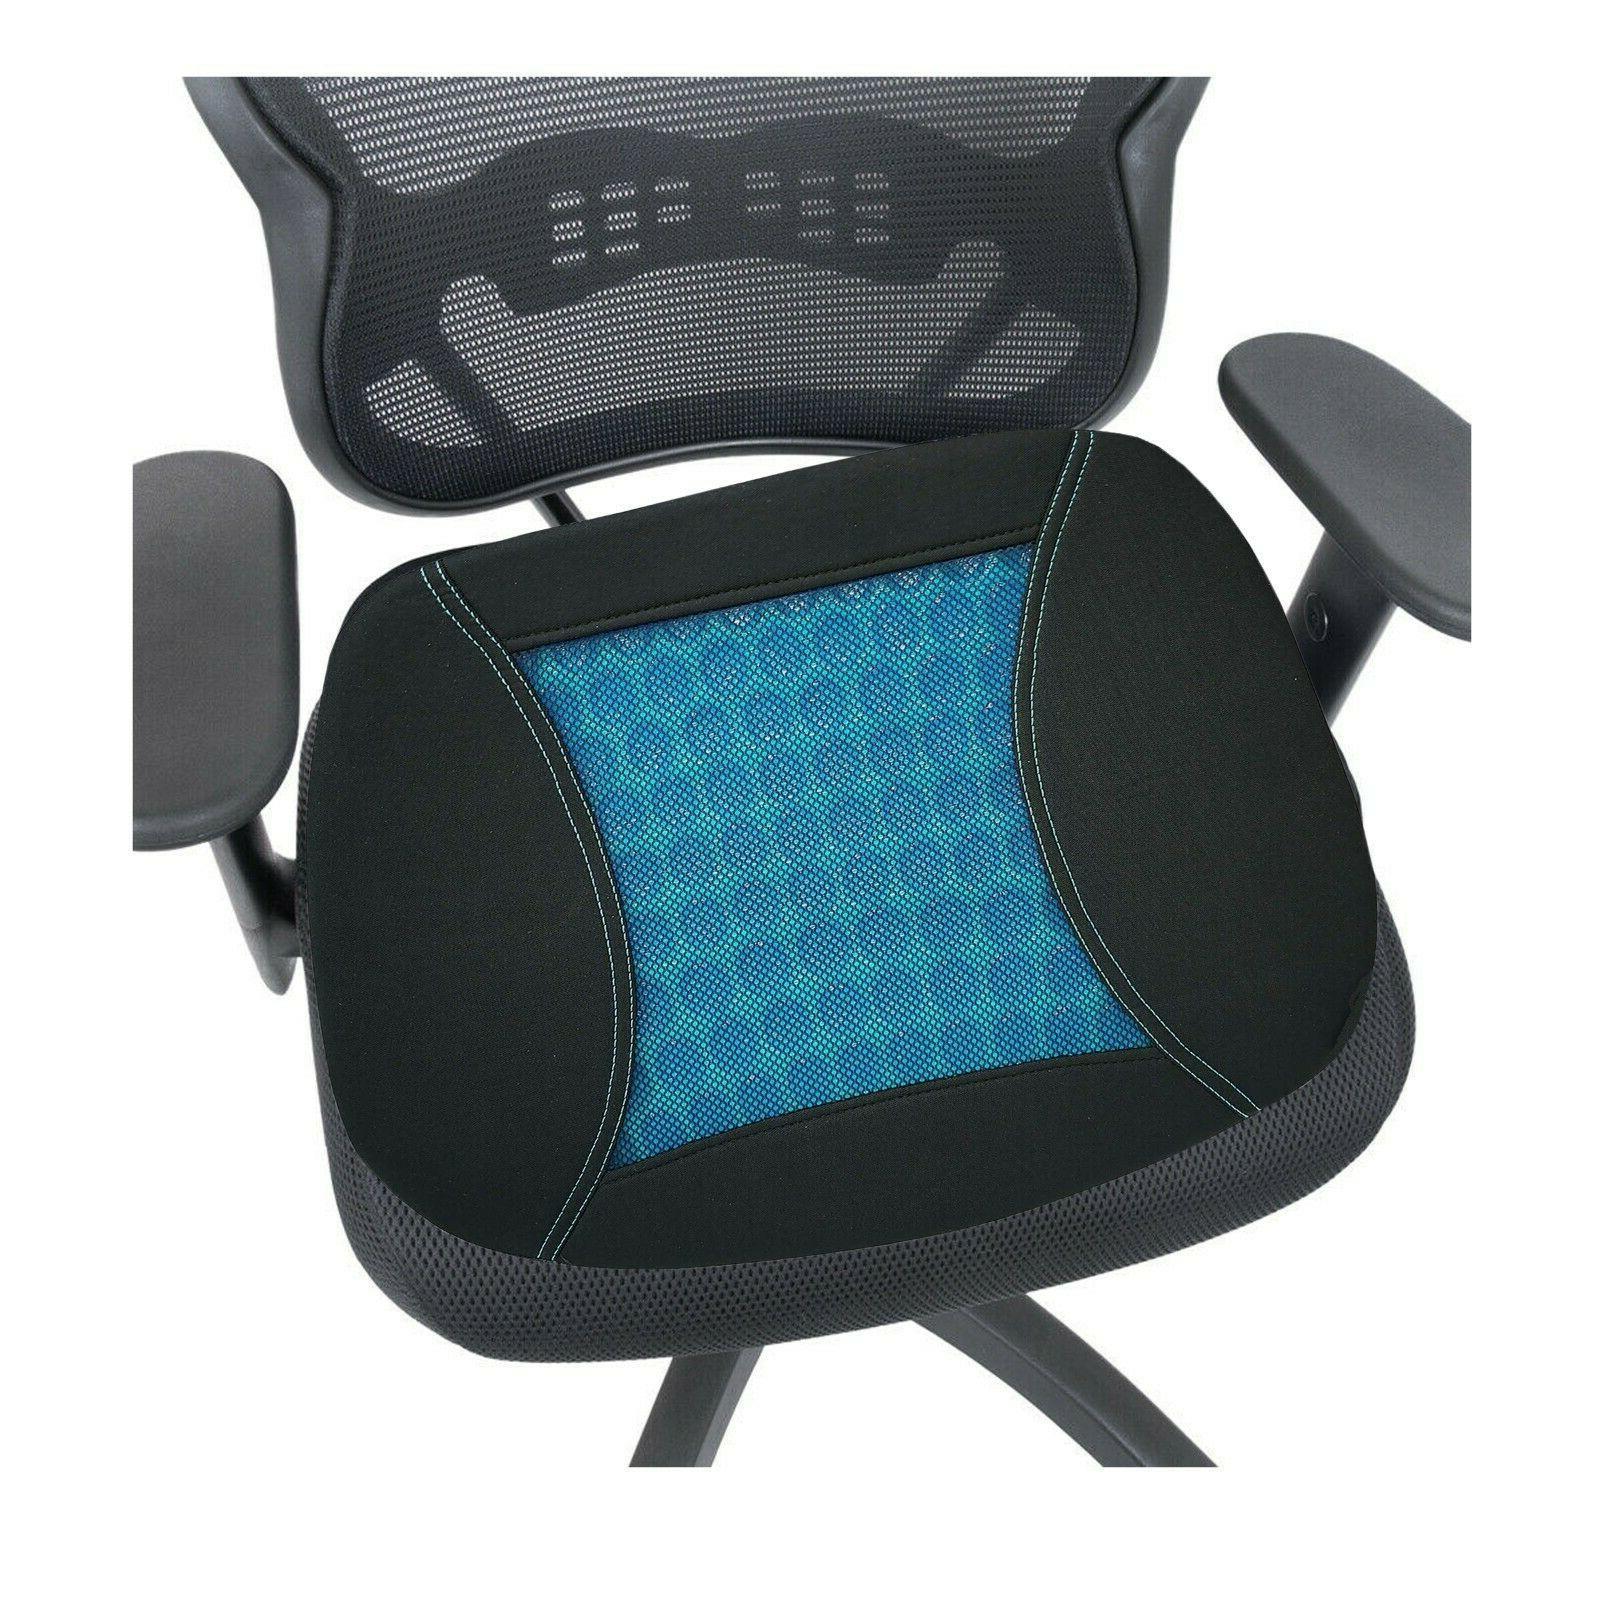 Orthopedic Gel Foam Seat Cushion Office